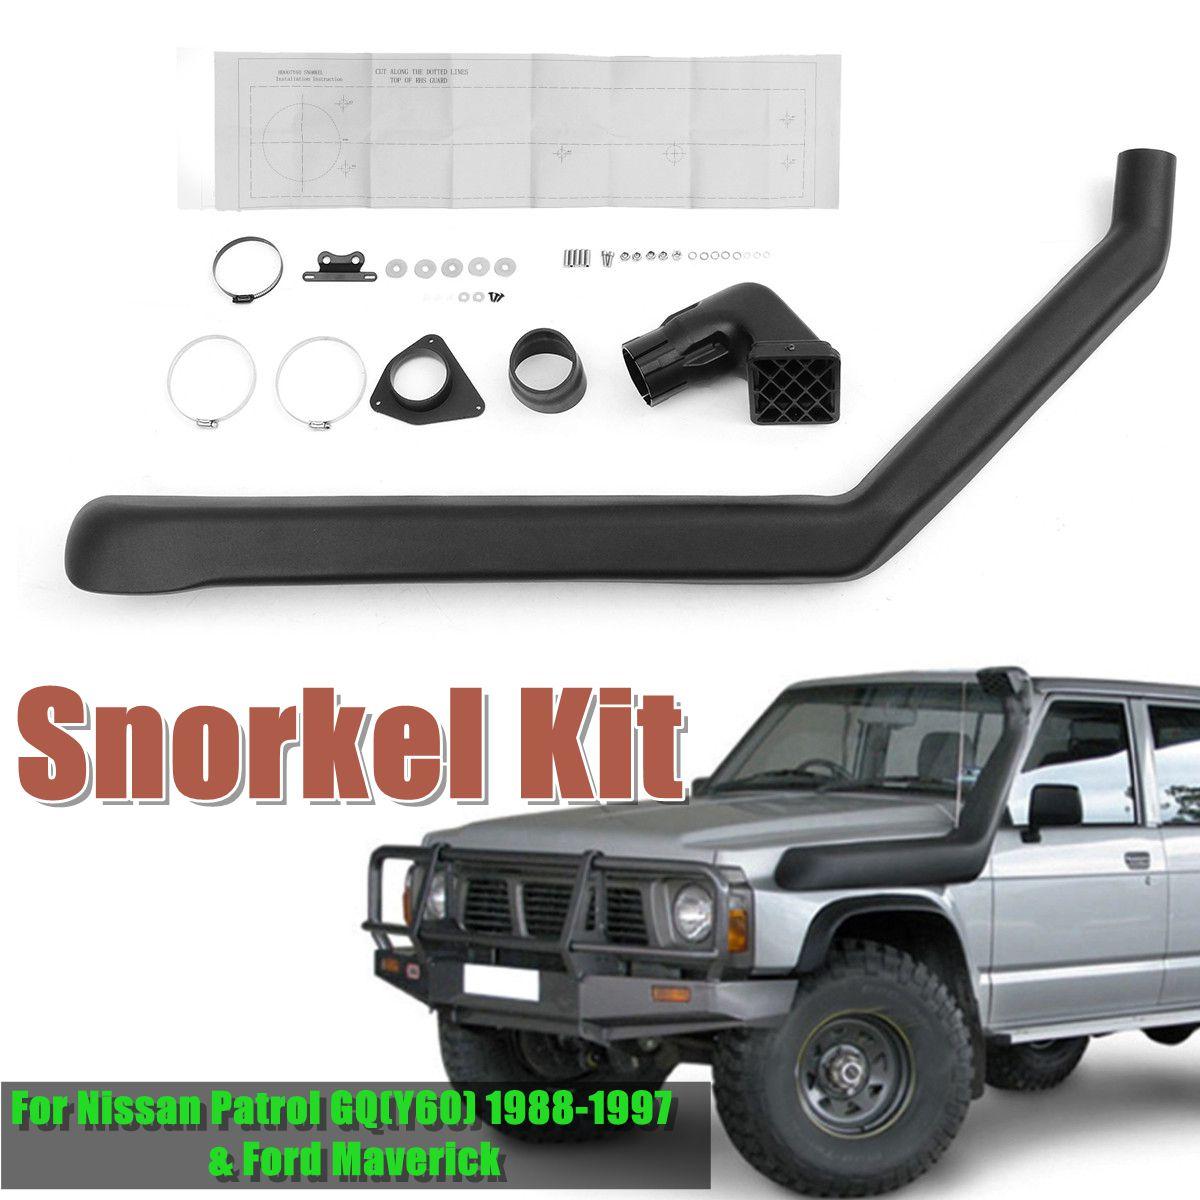 Intake Snorkel Kit For Nissan Patrol GQ(Y60) 1988-1997 For Ford Maverick Air Intake System